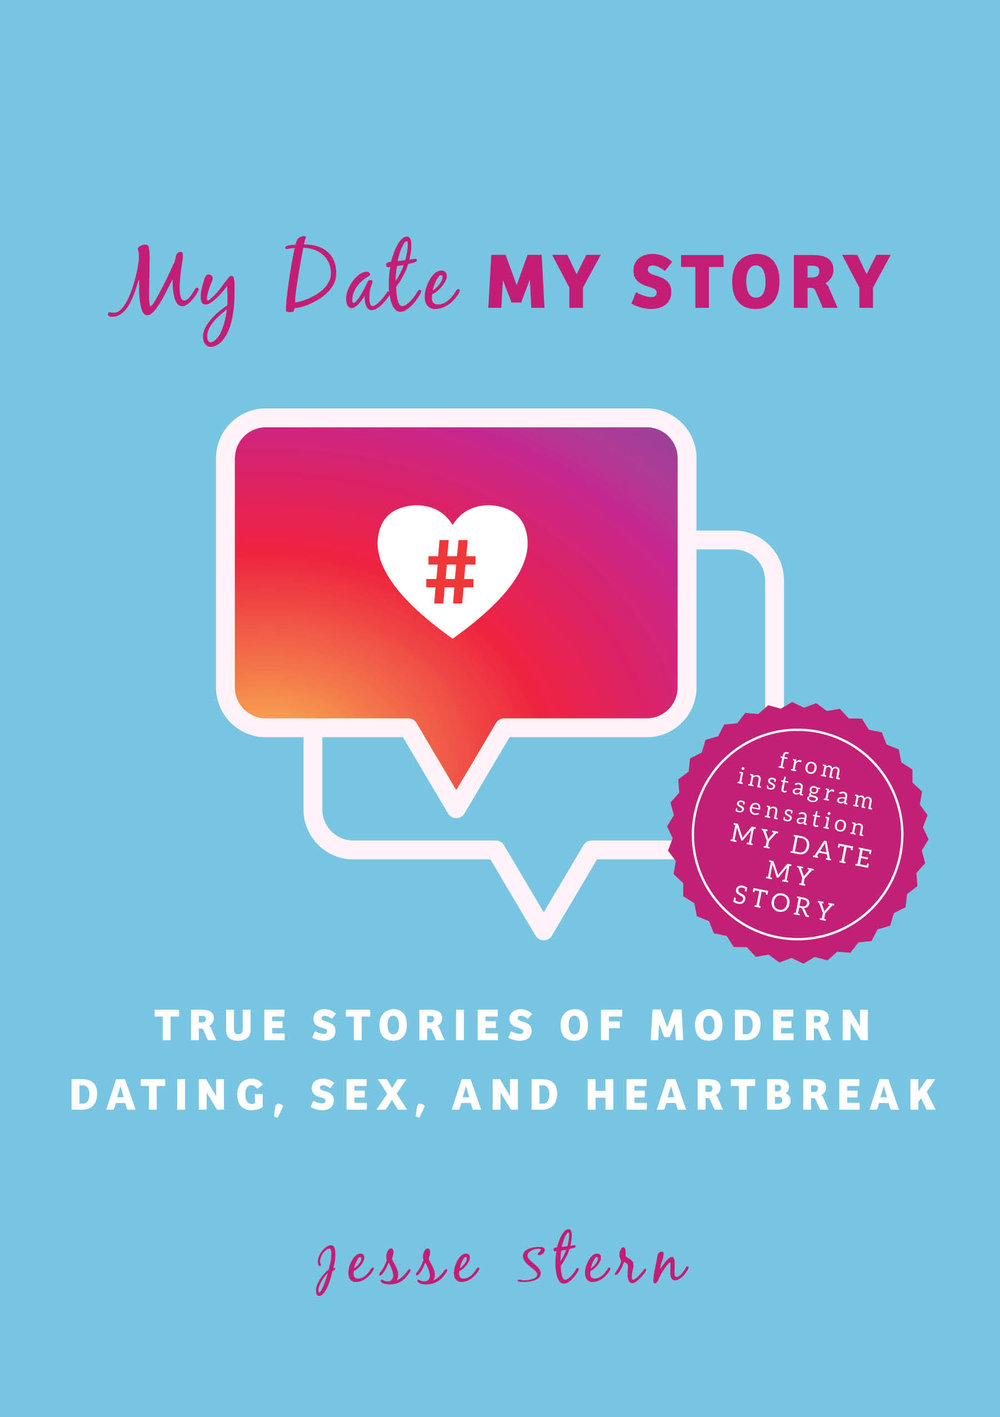 my-date-my-story.JPG